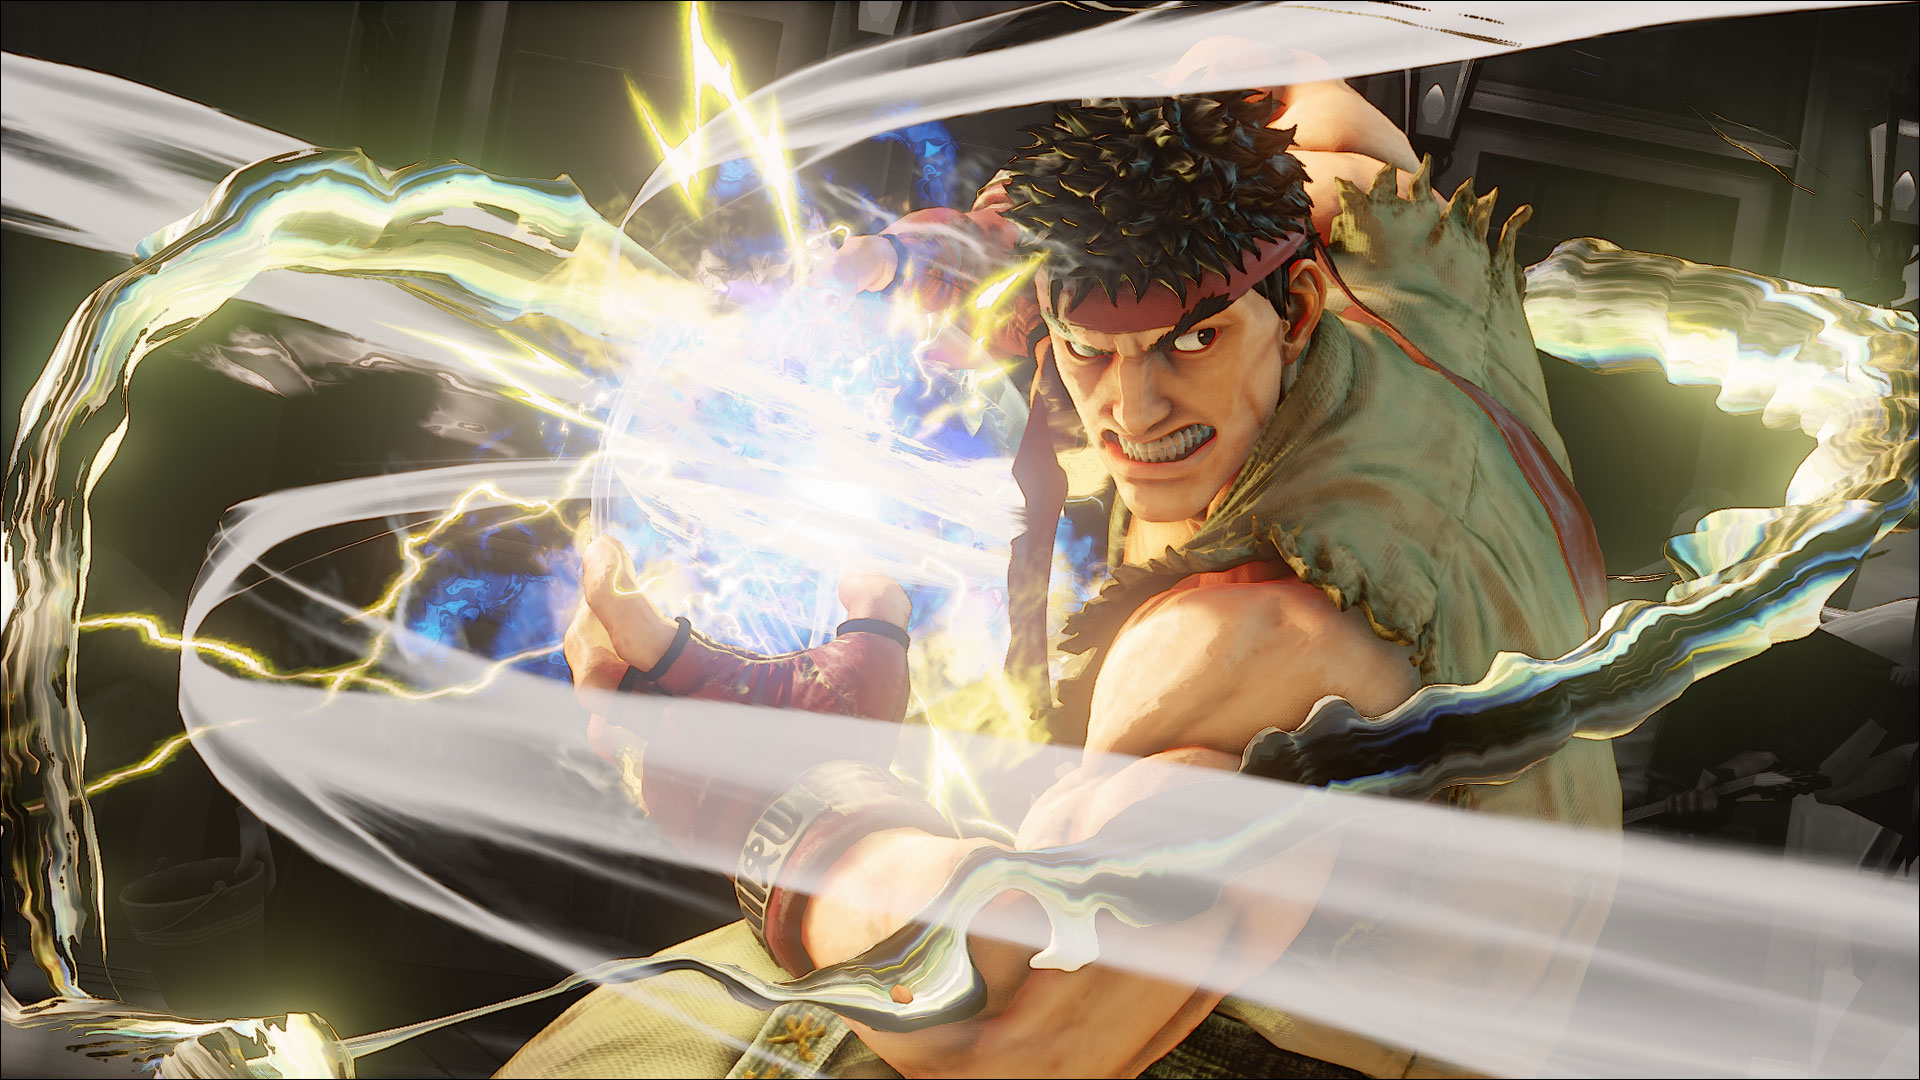 Sfv Street Fighter V Beta Ryu Vs Chun Li Ps4 Gameplay